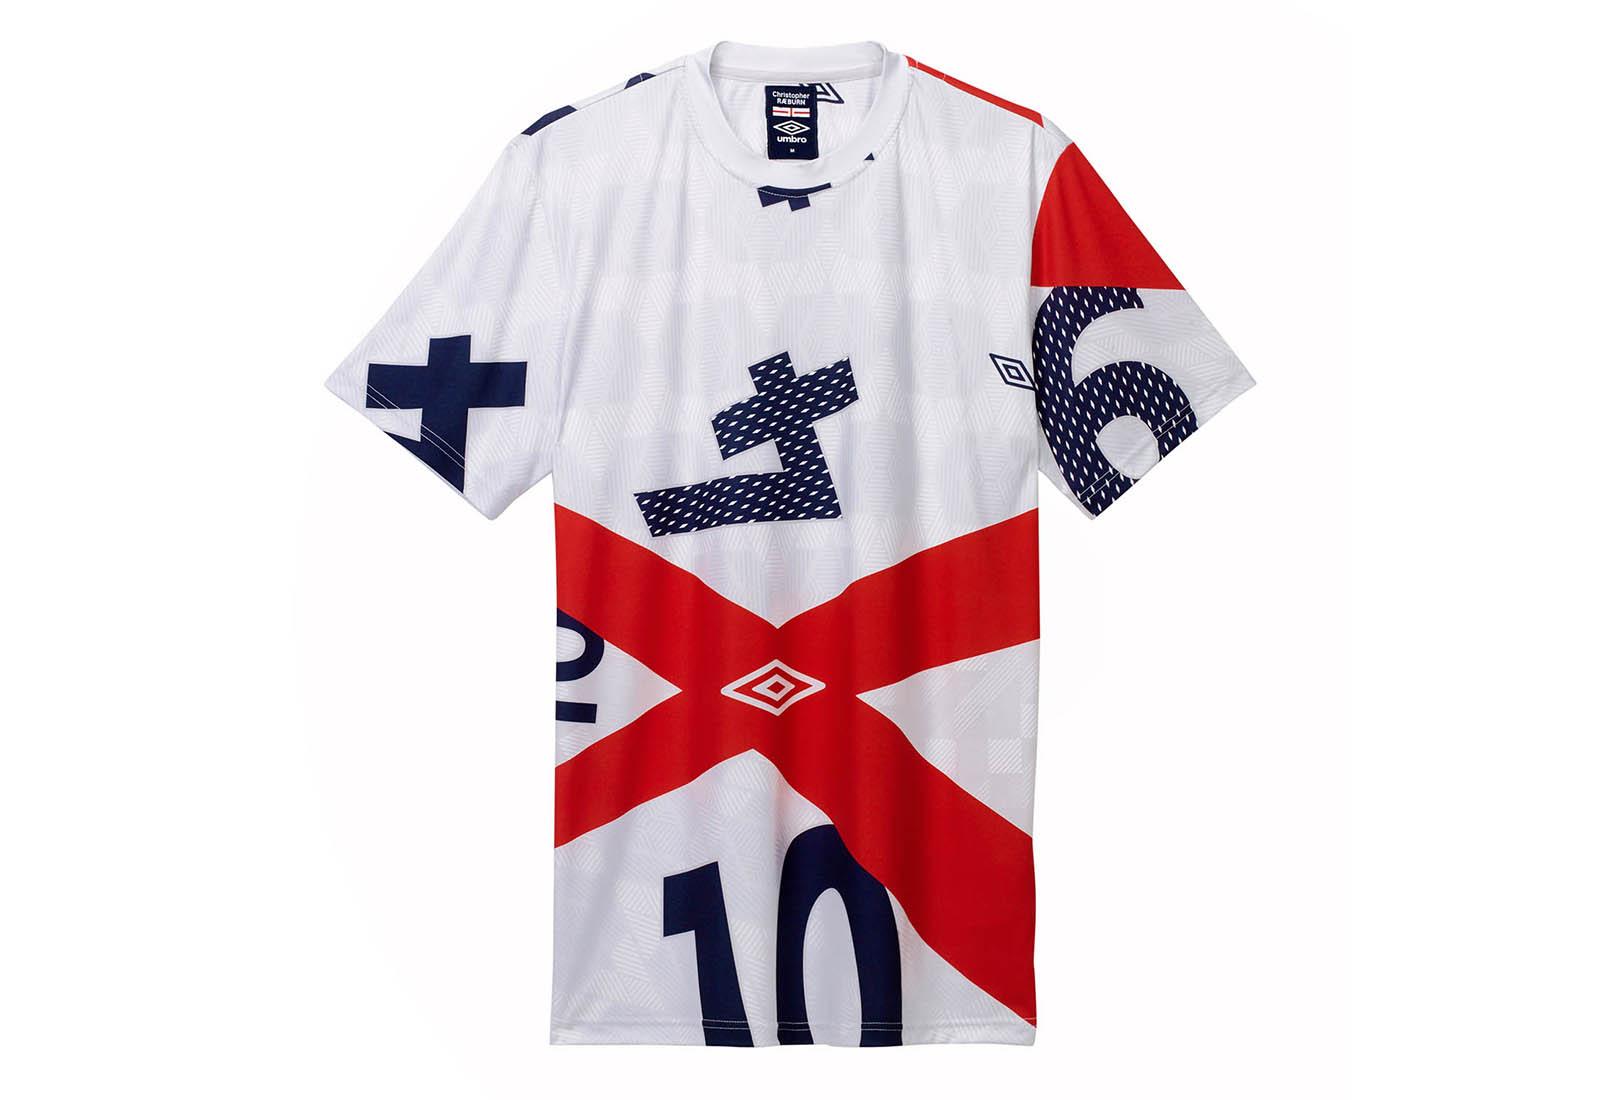 christopher-raeburn-umbro-collaboration-soccerbible-full-collection_0000_umbro-x-christopher-raeburn-remix-tee-white